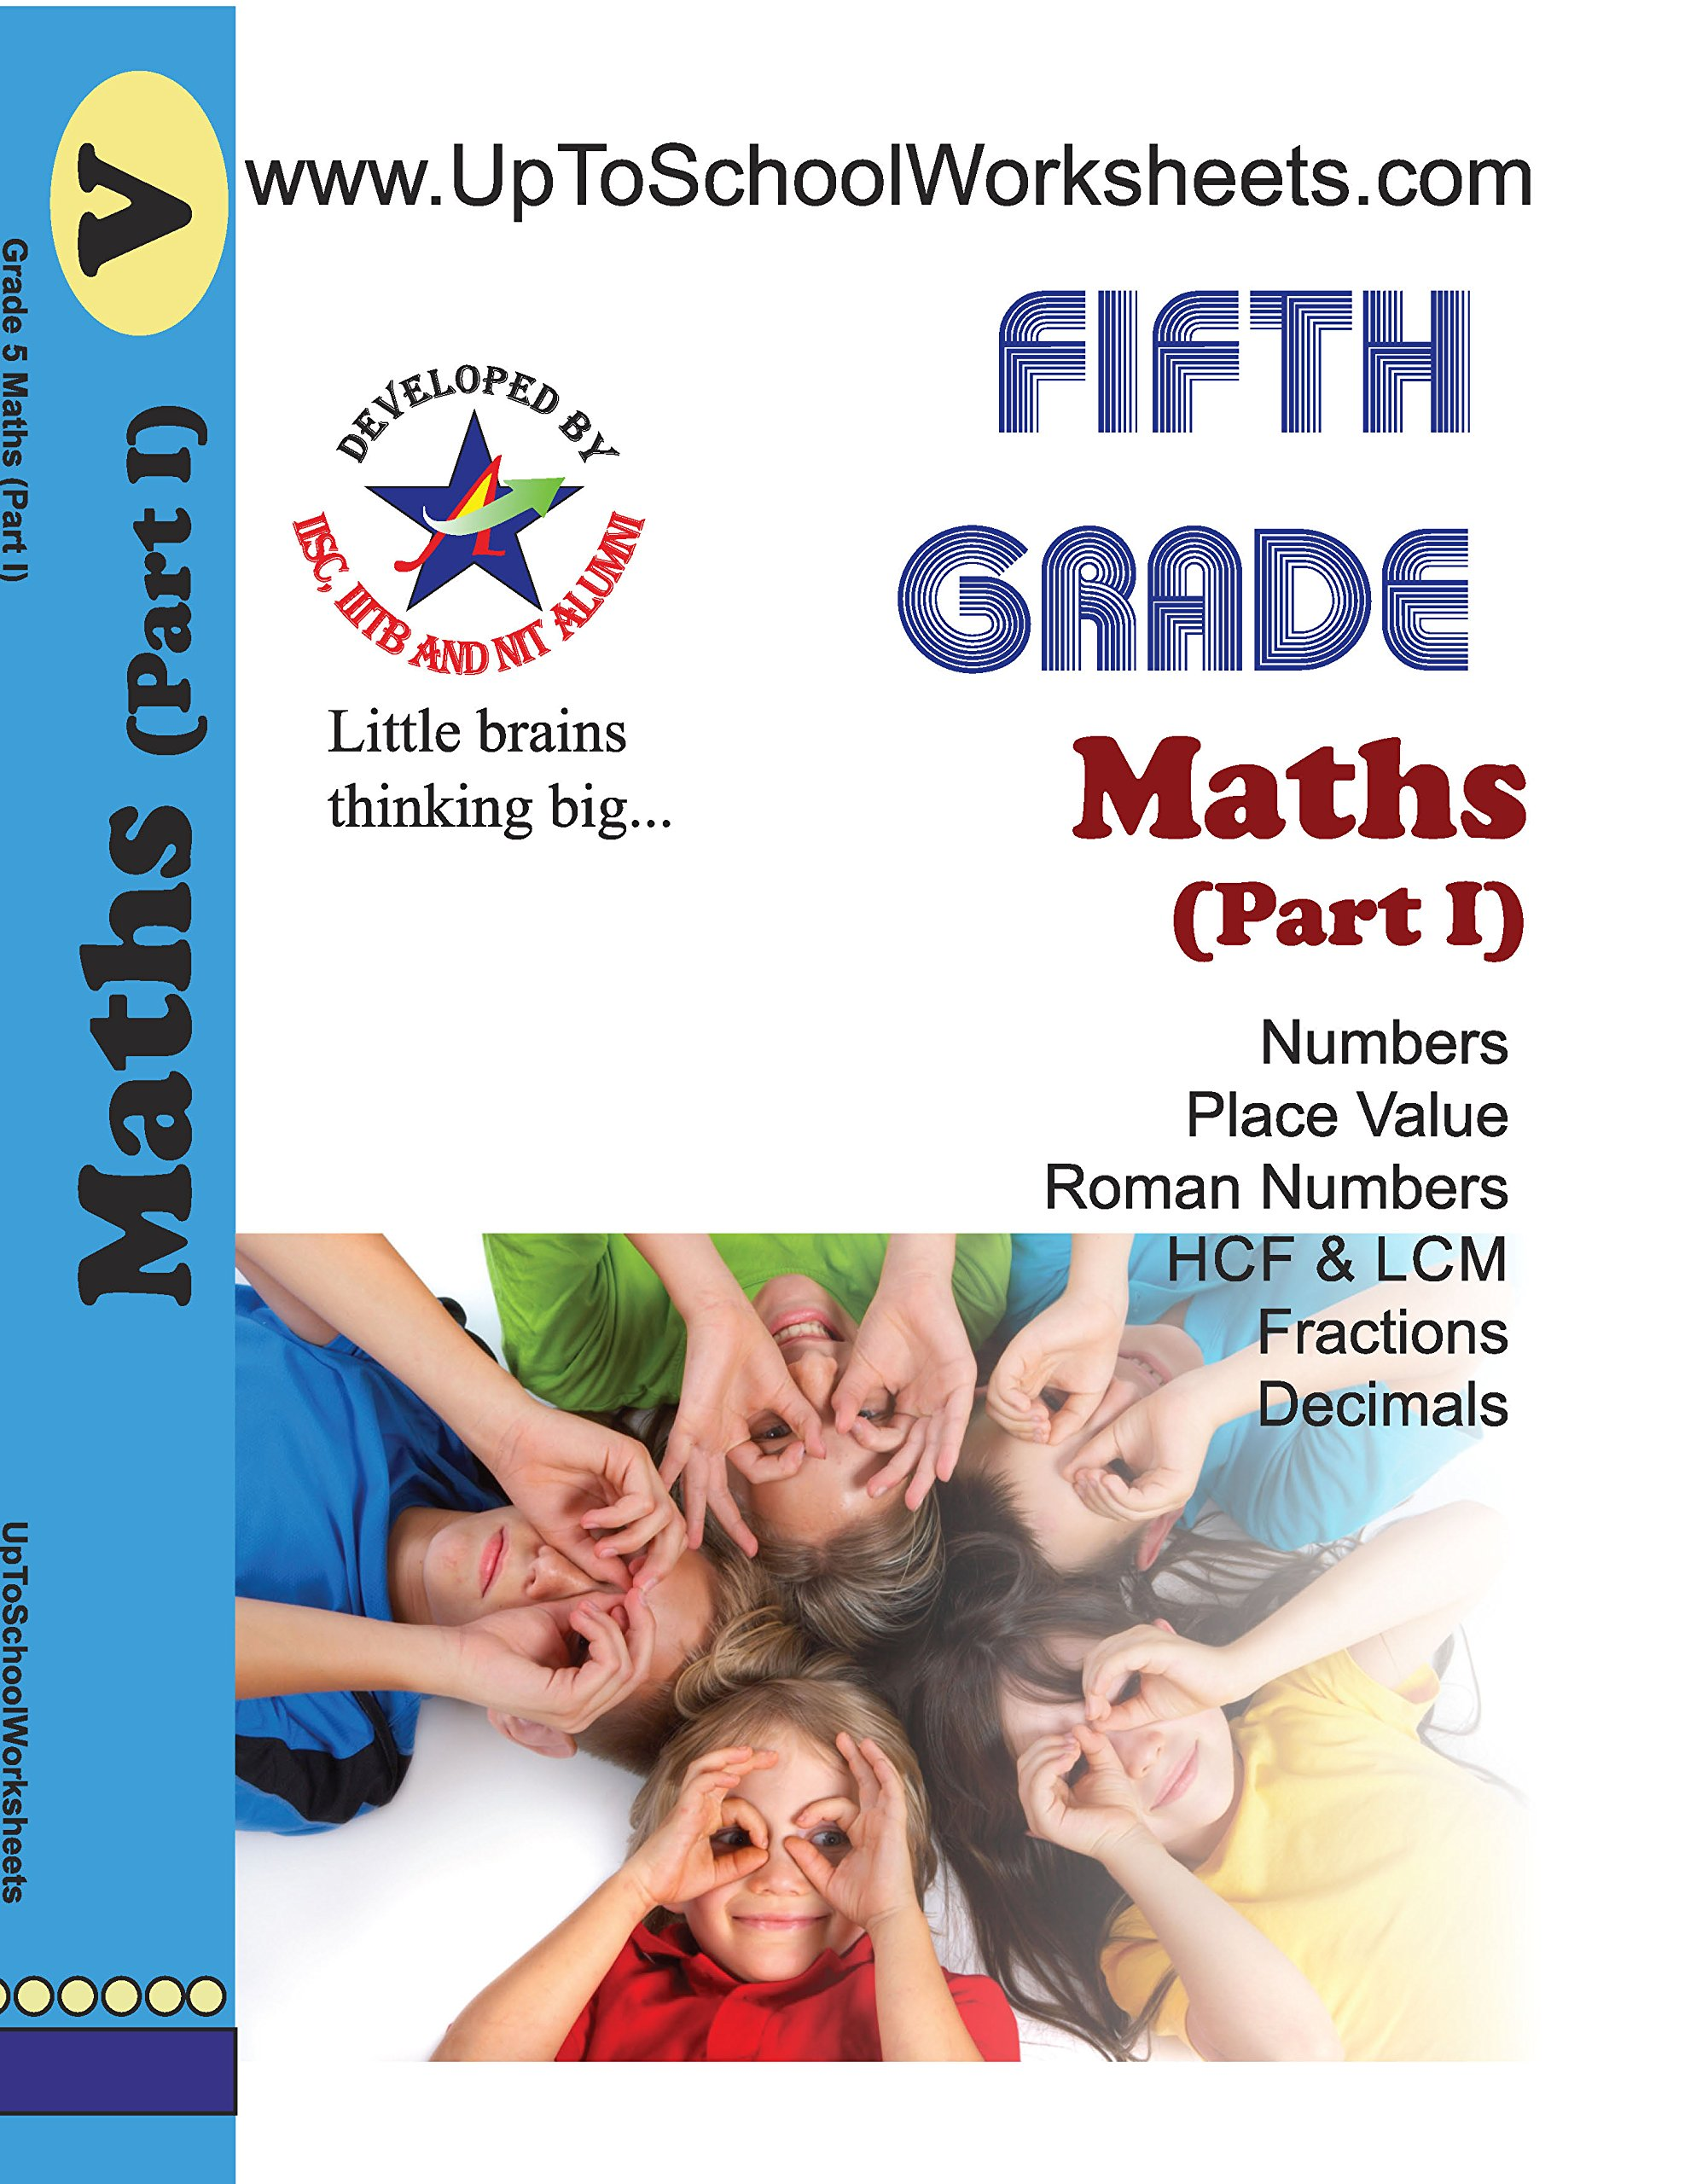 amazonin buy class  math worksheets part  cbseicse book online  class  math worksheets part  cbseicse paperback   nov